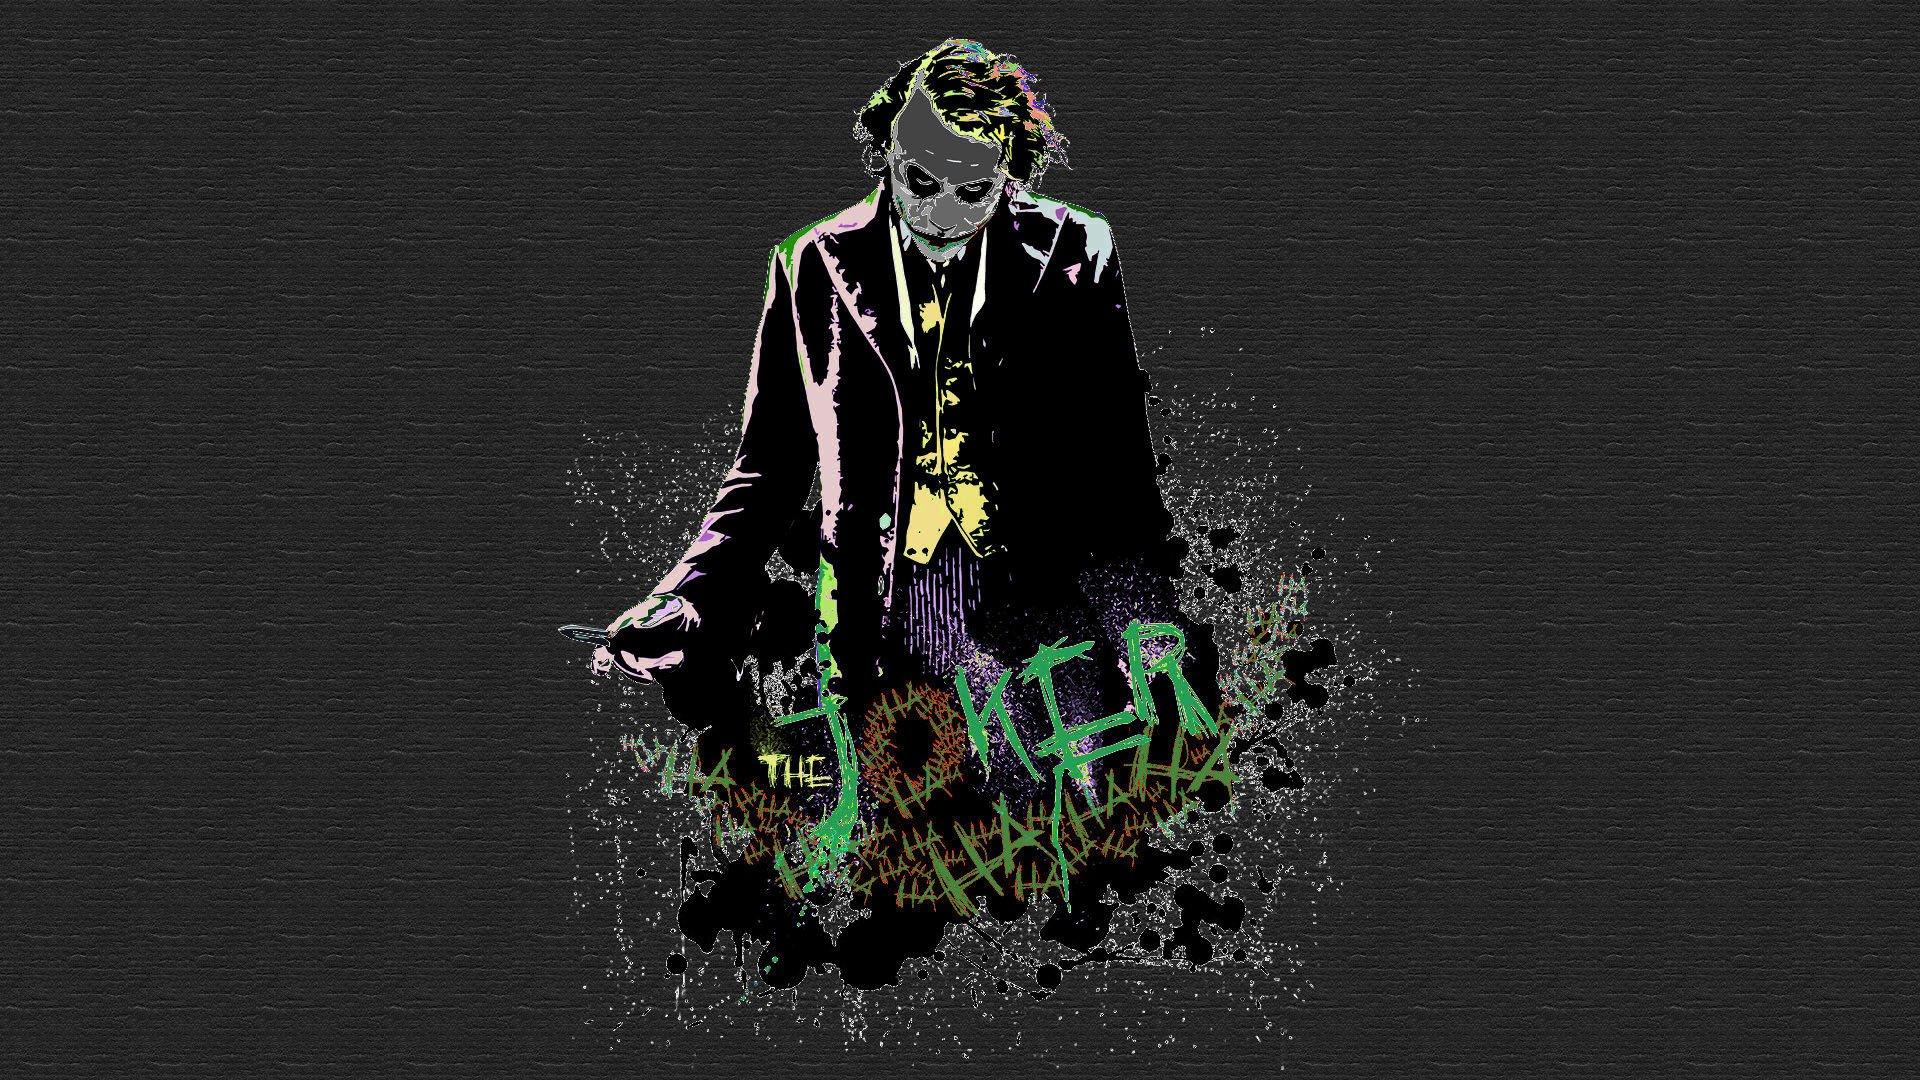 Batman The Joker Heath Ledger Wallpaper